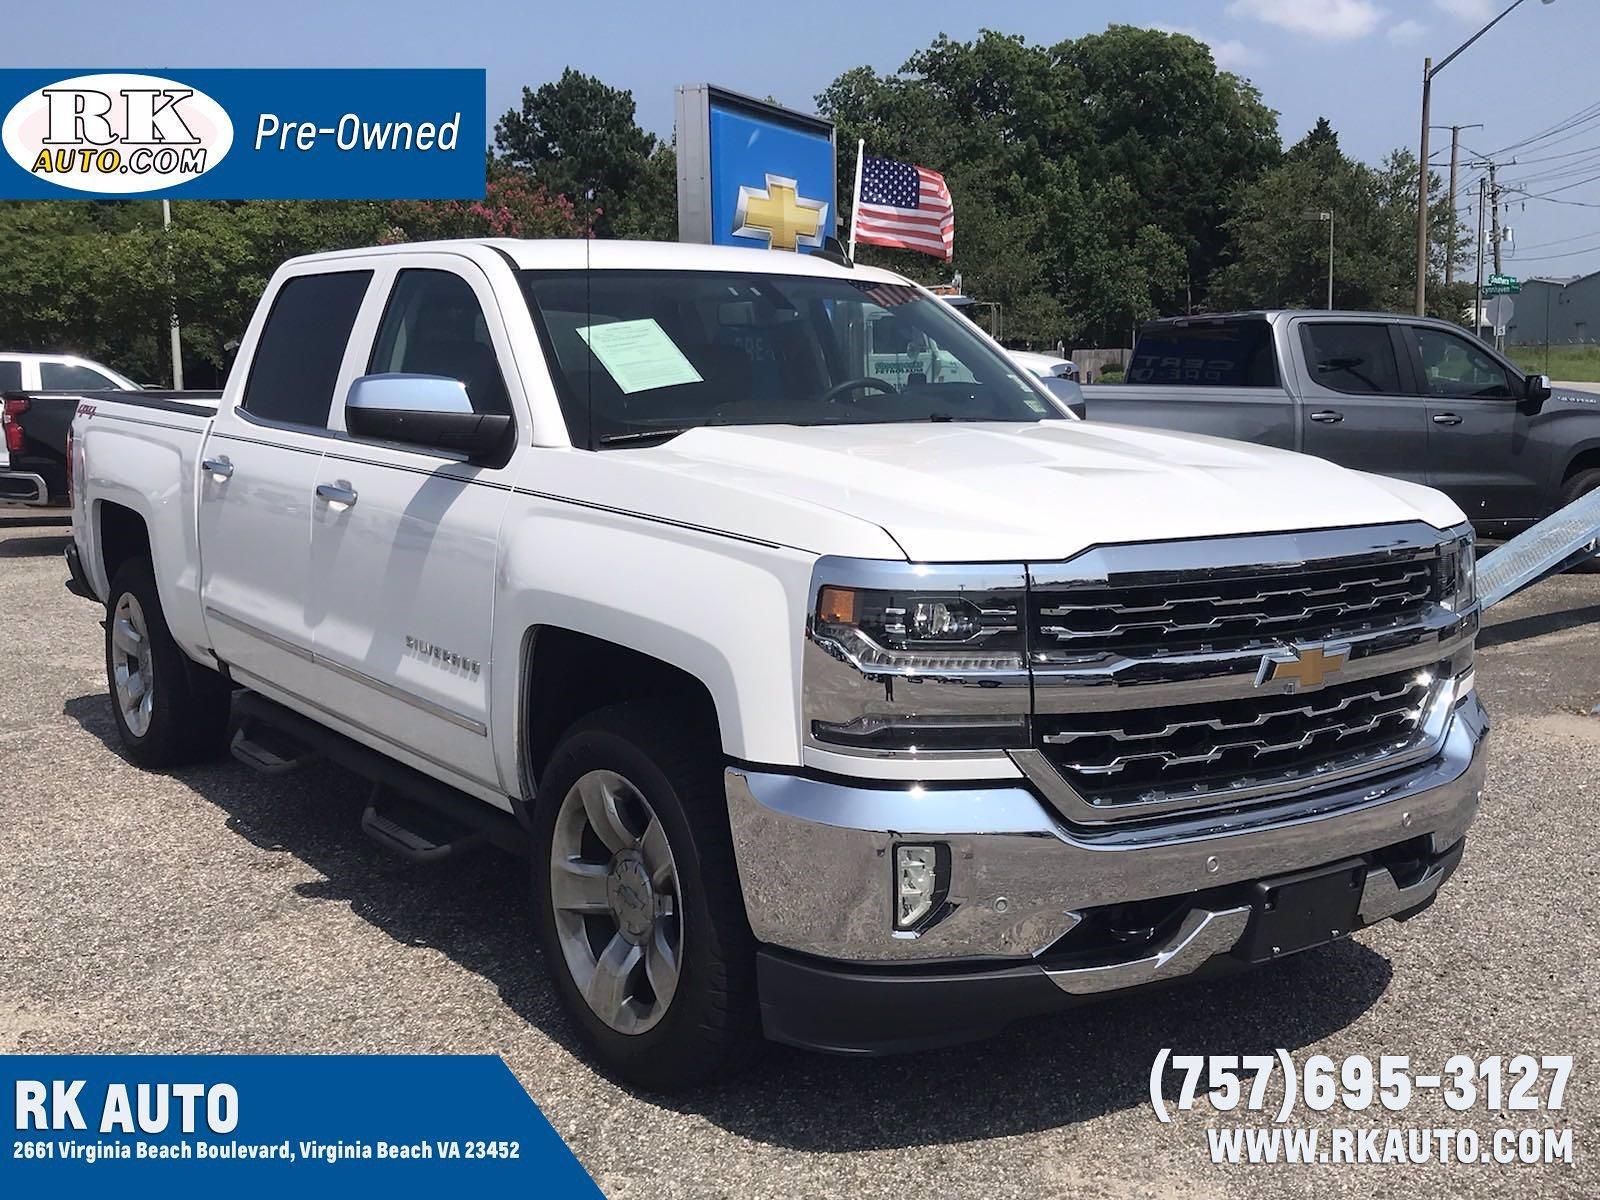 2018 Chevrolet Silverado 1500 Crew Cab 4x4, Pickup #16636P - photo 1